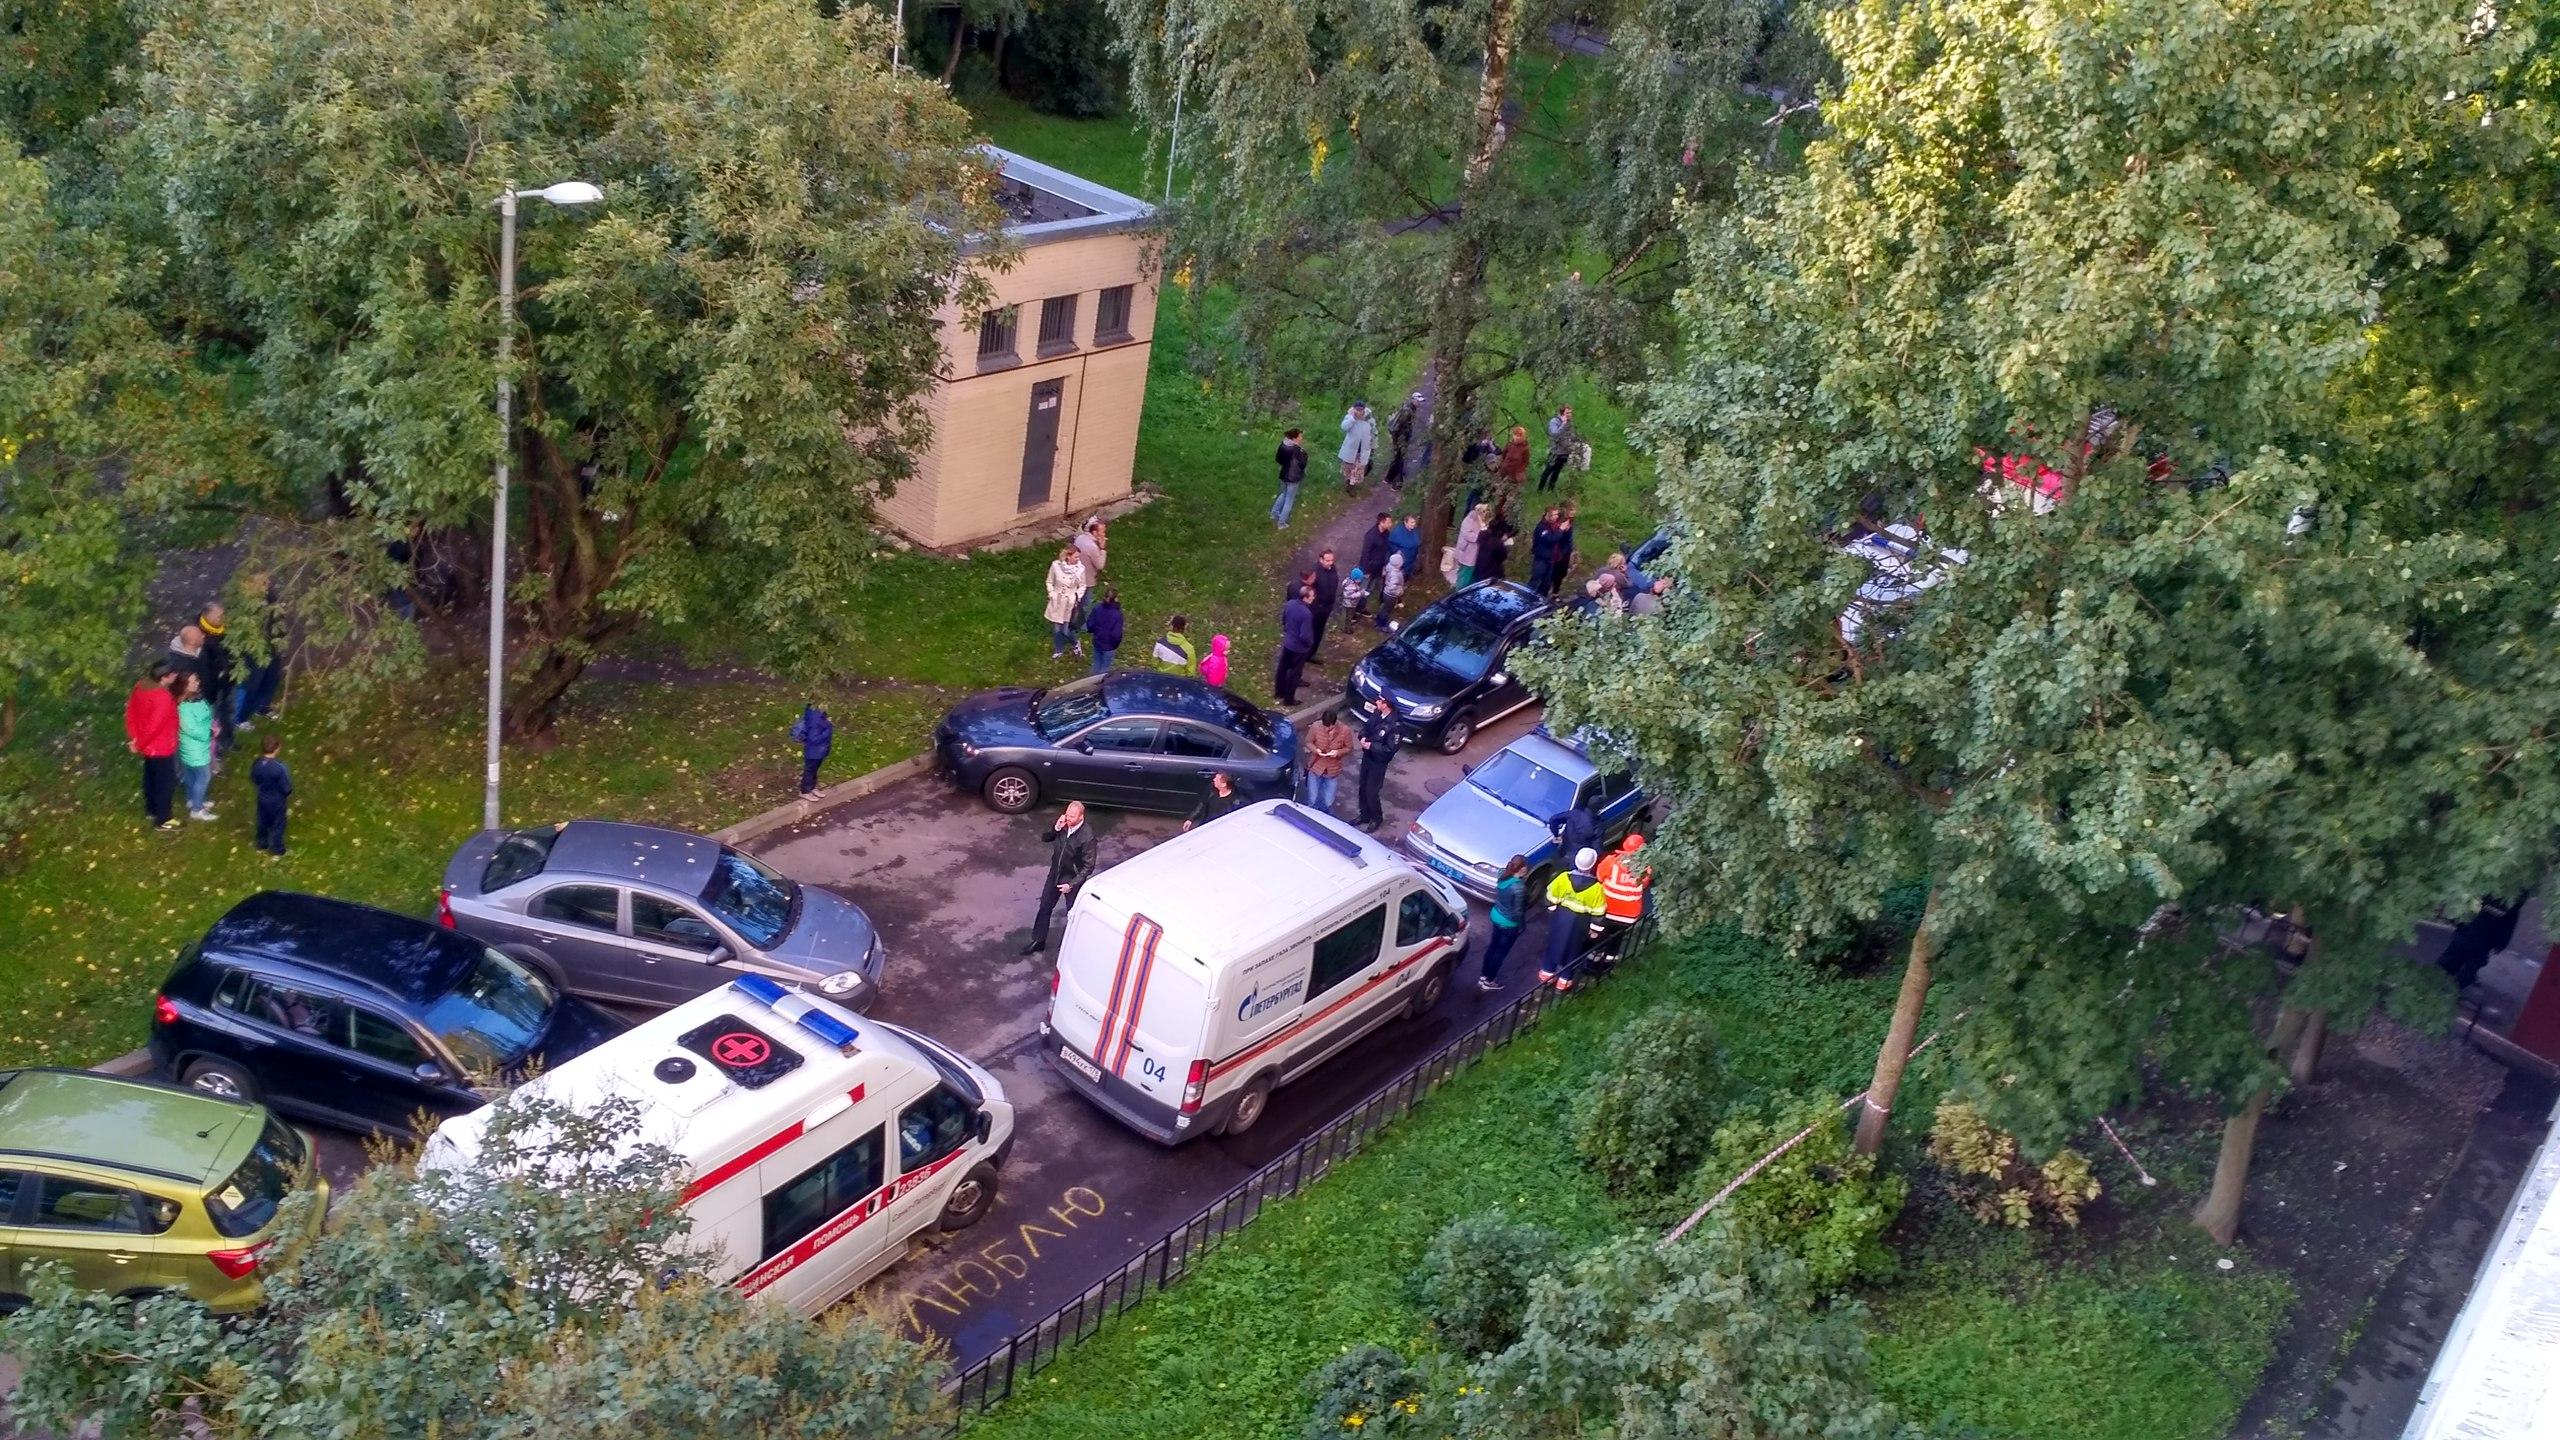 ВПетербурге эвакуировали дом из-за хлопка газа